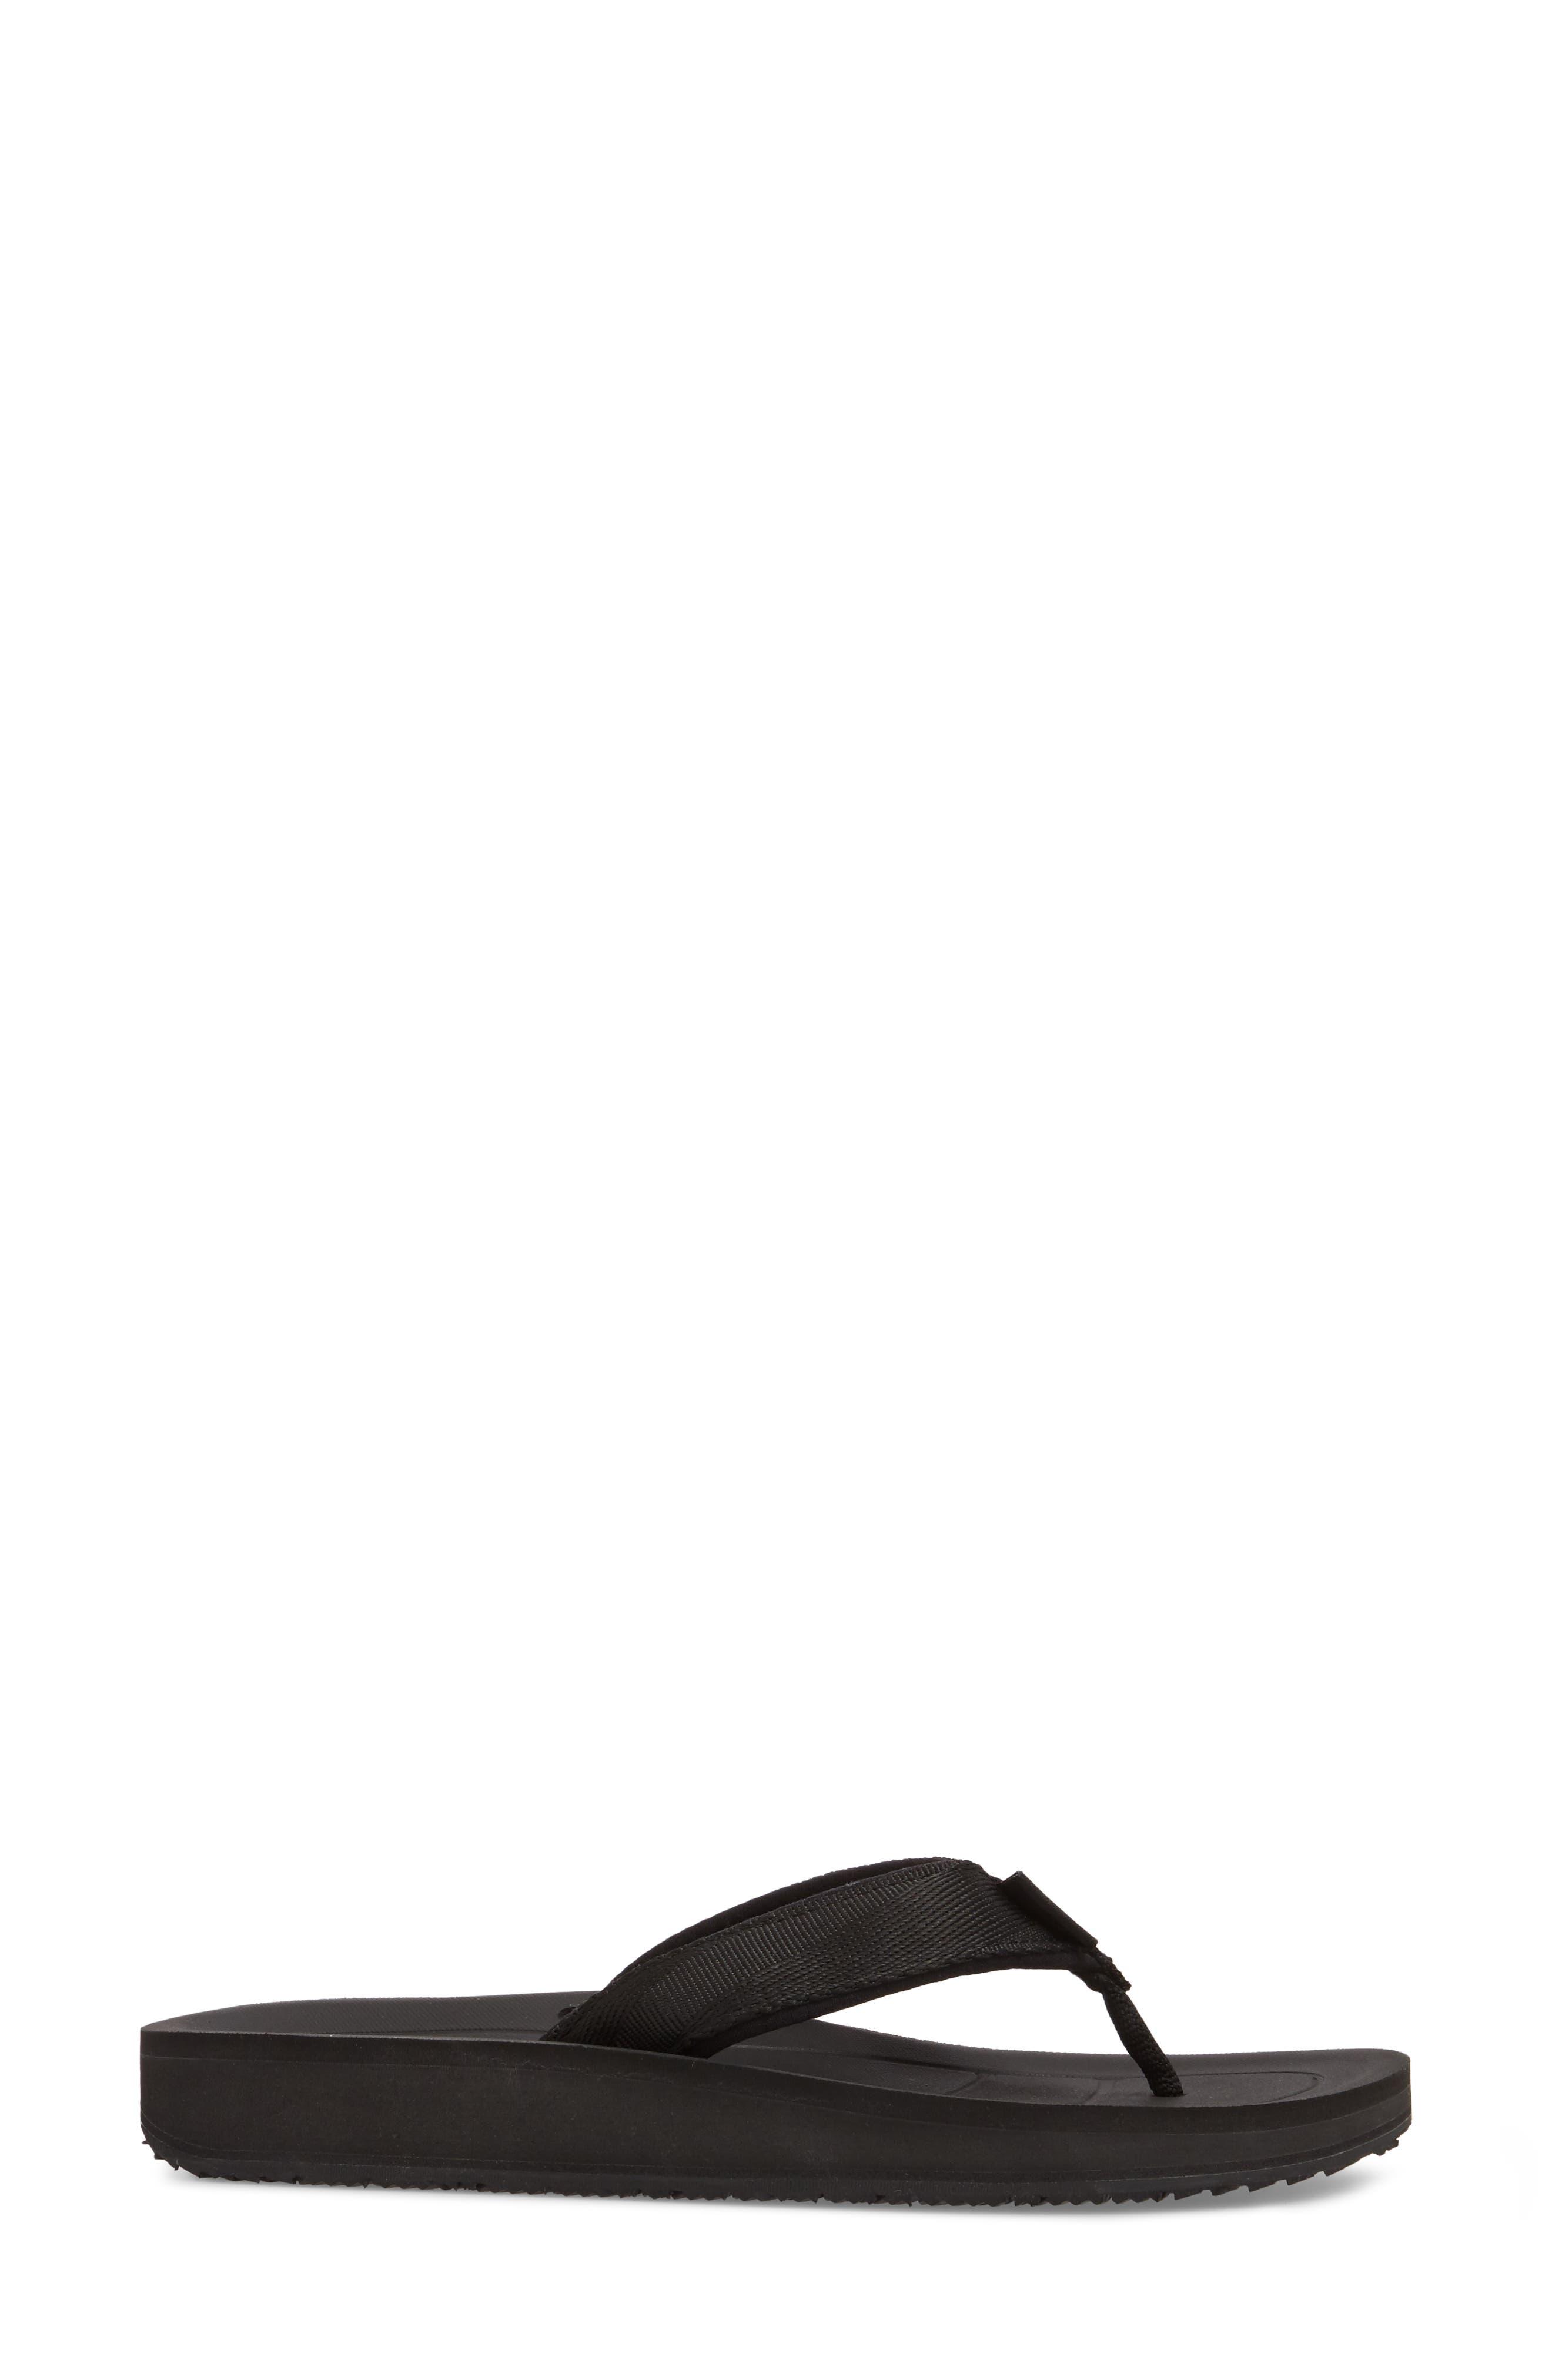 Flip Premier Sandal,                             Alternate thumbnail 3, color,                             001